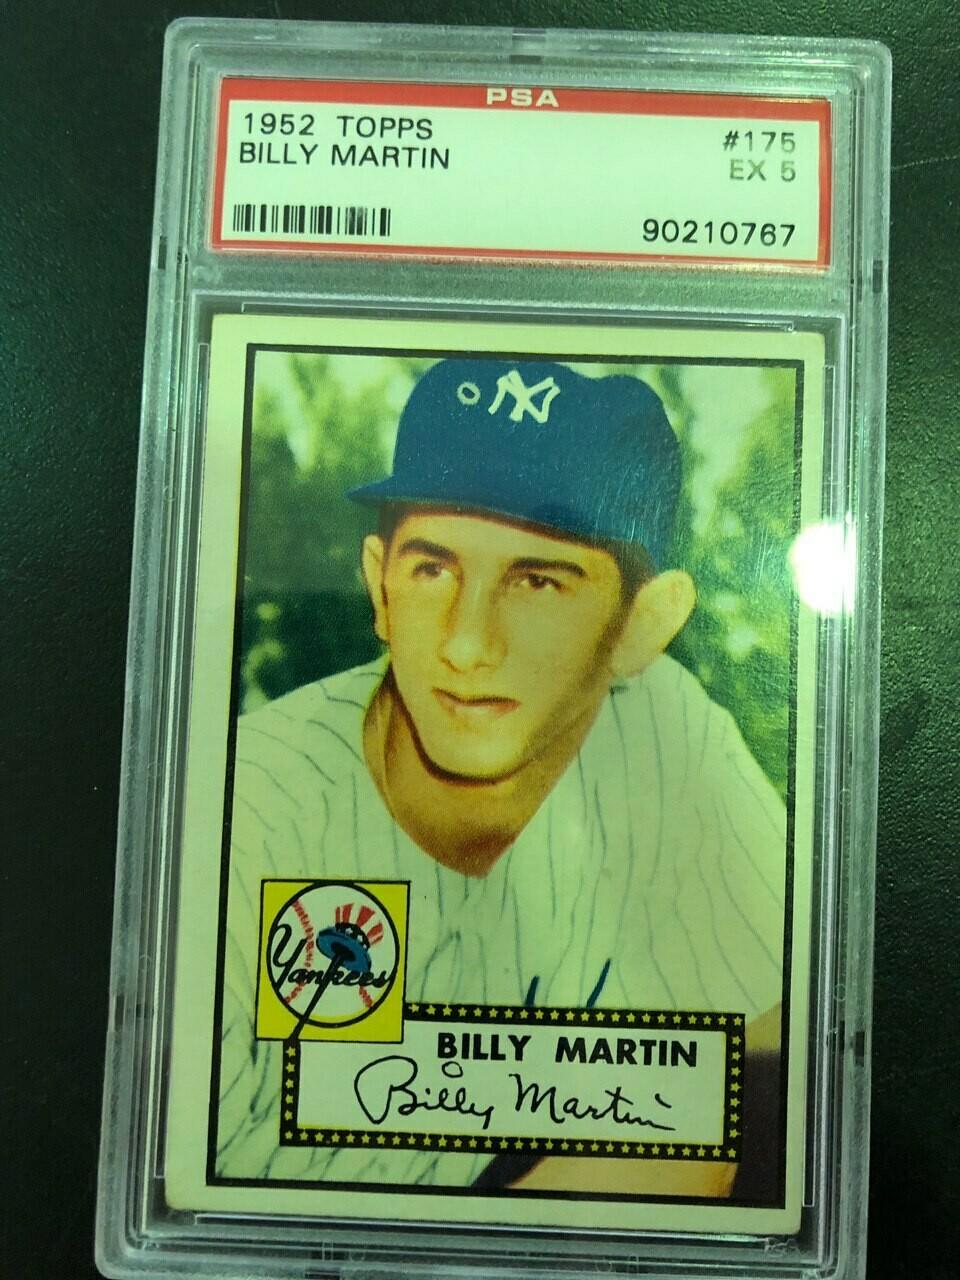 1952 Topps #175 Billy Martin rookie, PSA graded 5, $395